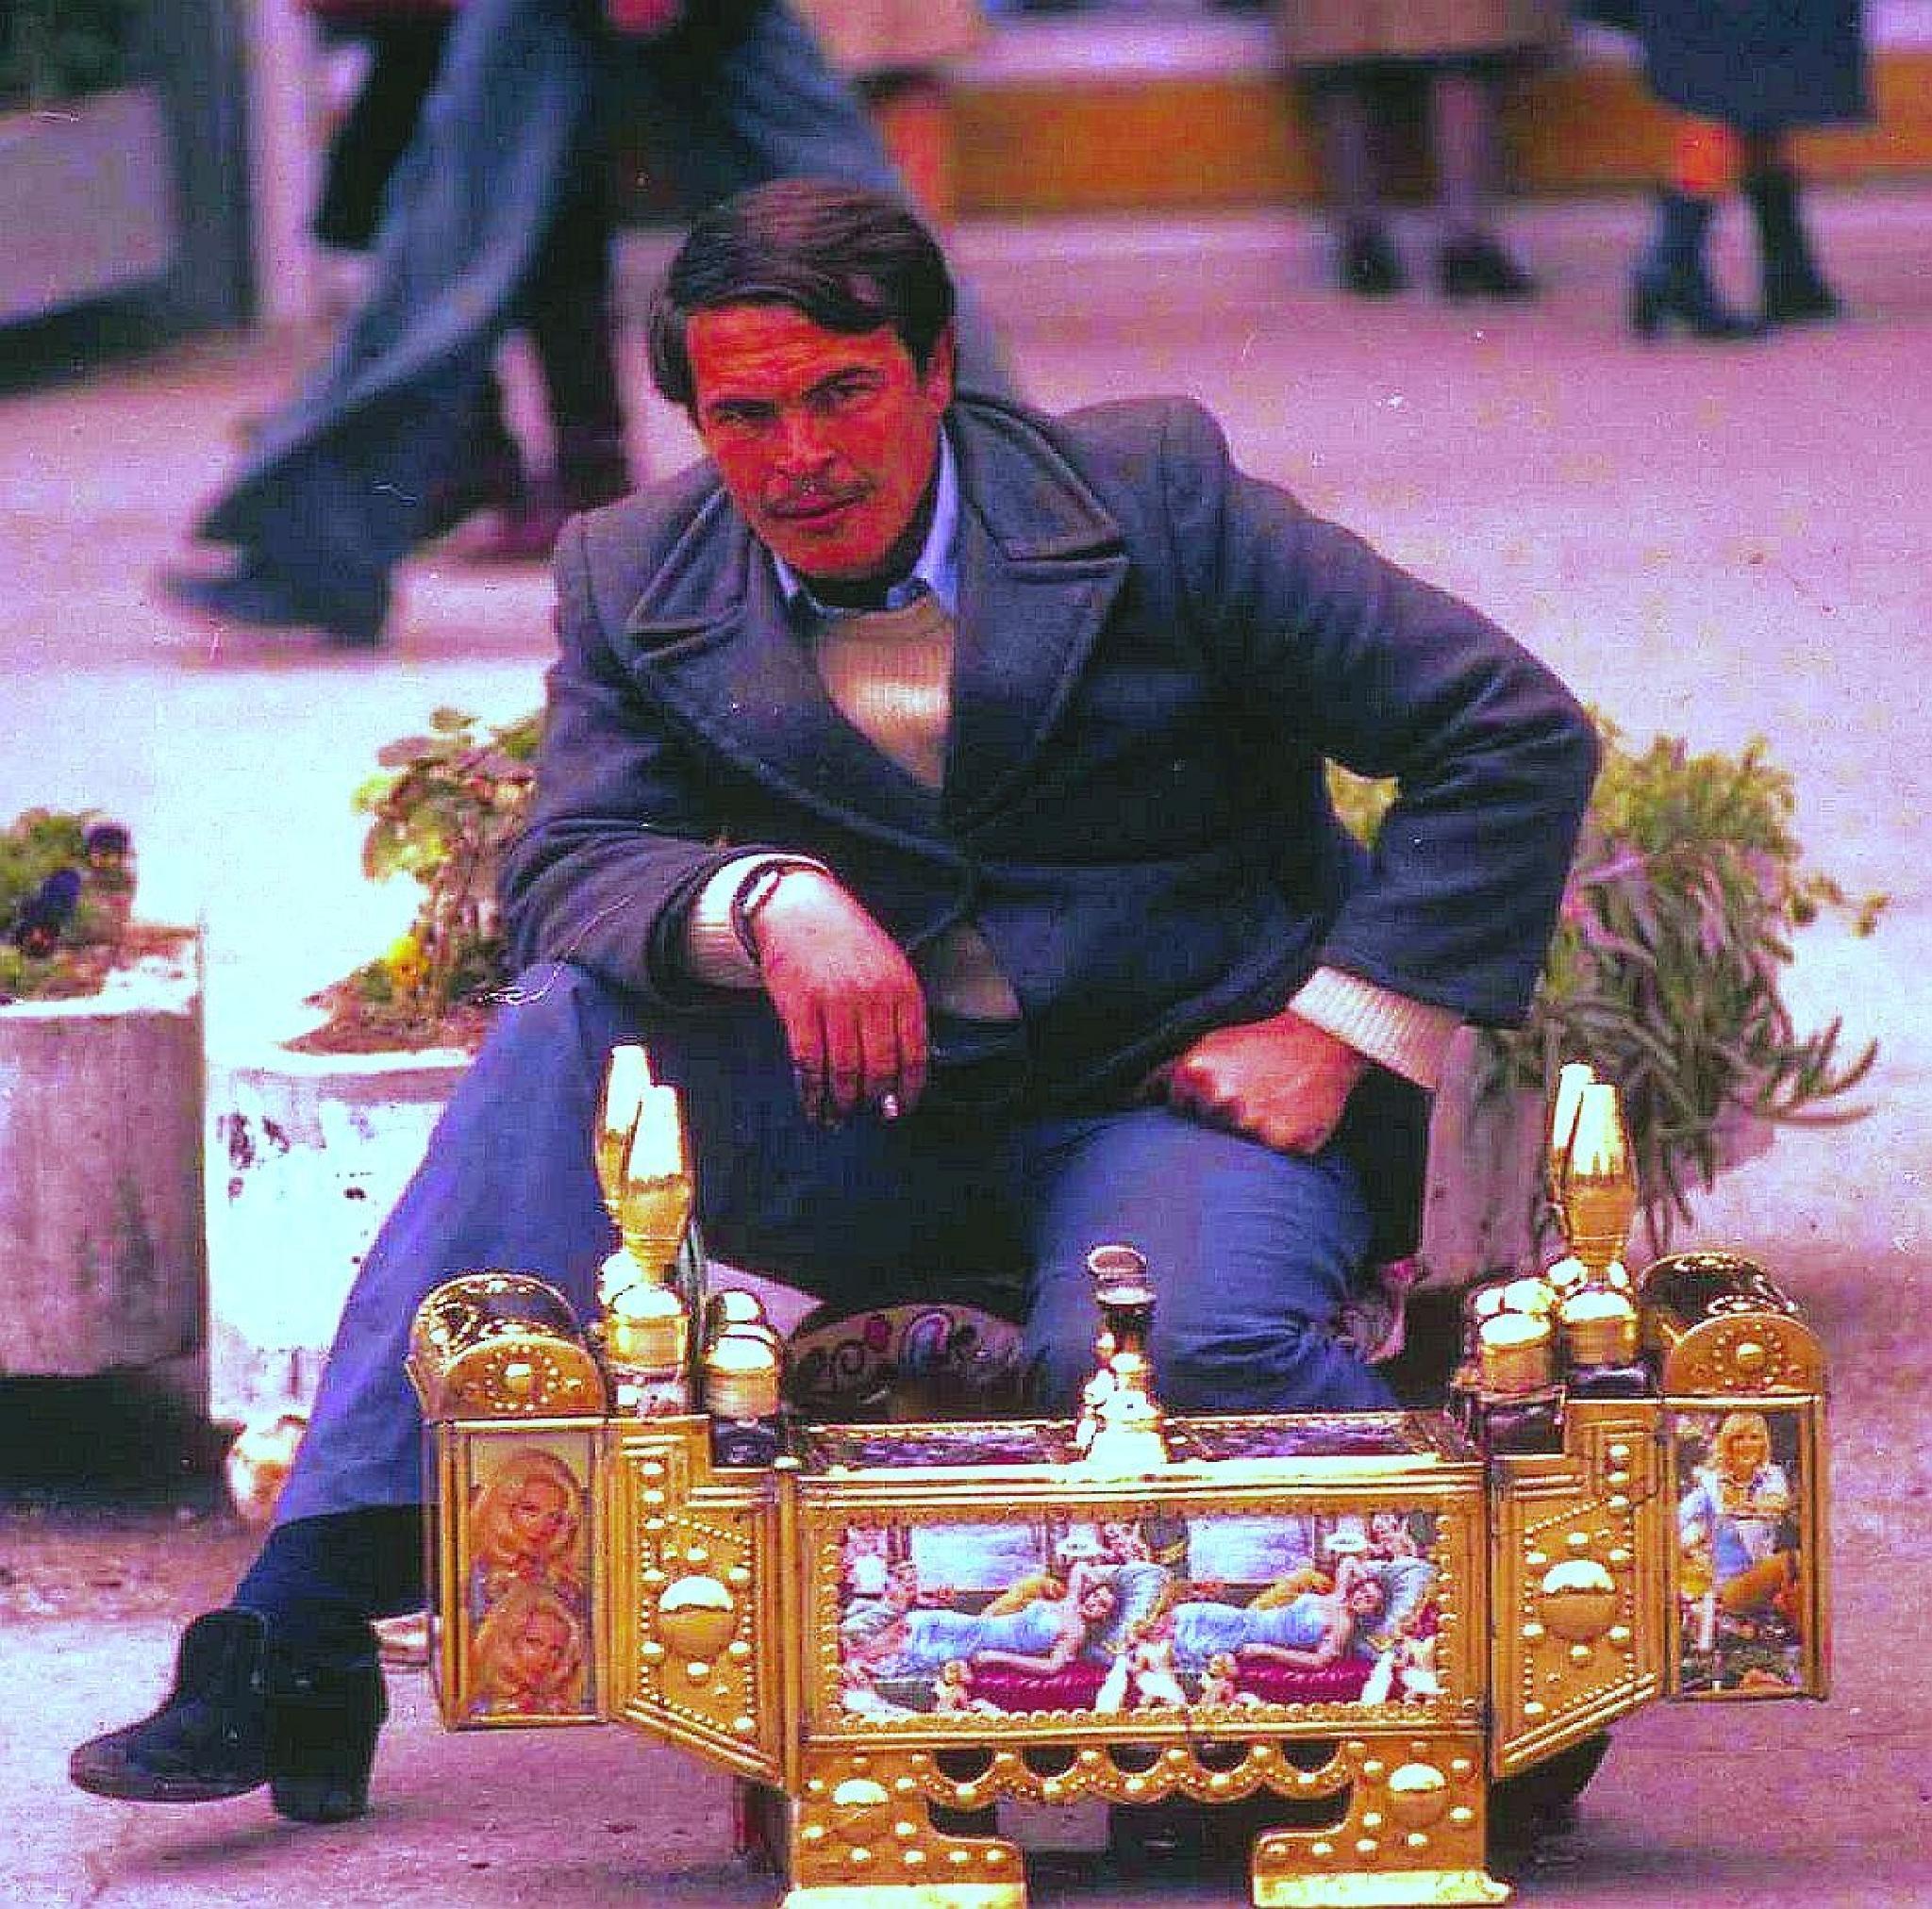 Turkish shoe shine man by Mike Thompson